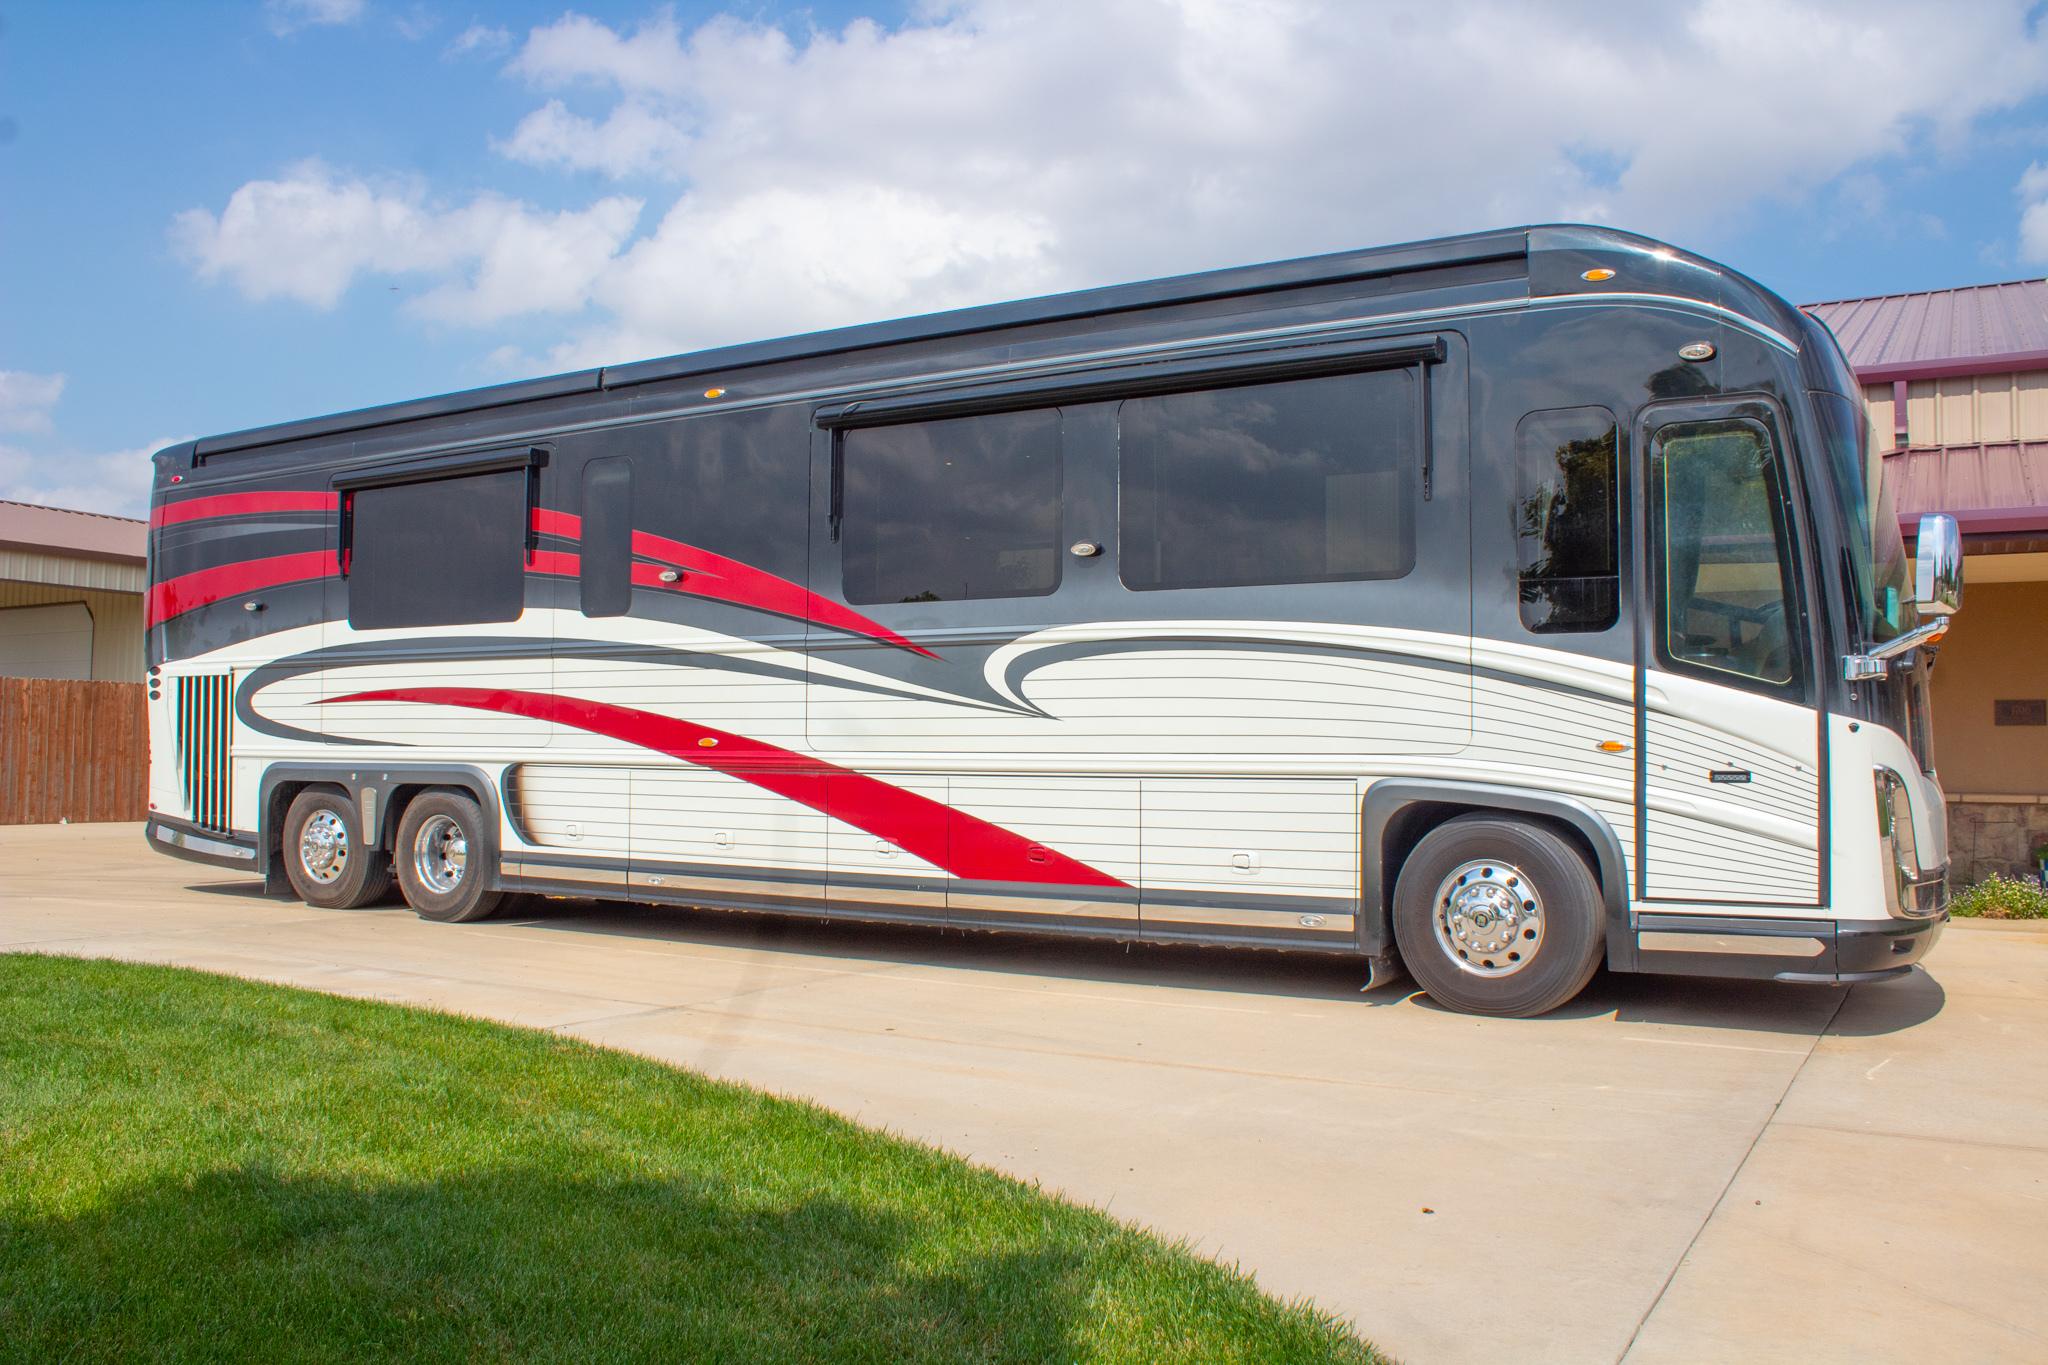 Photo Used 2012 Newell Coach Class A RV  $775000